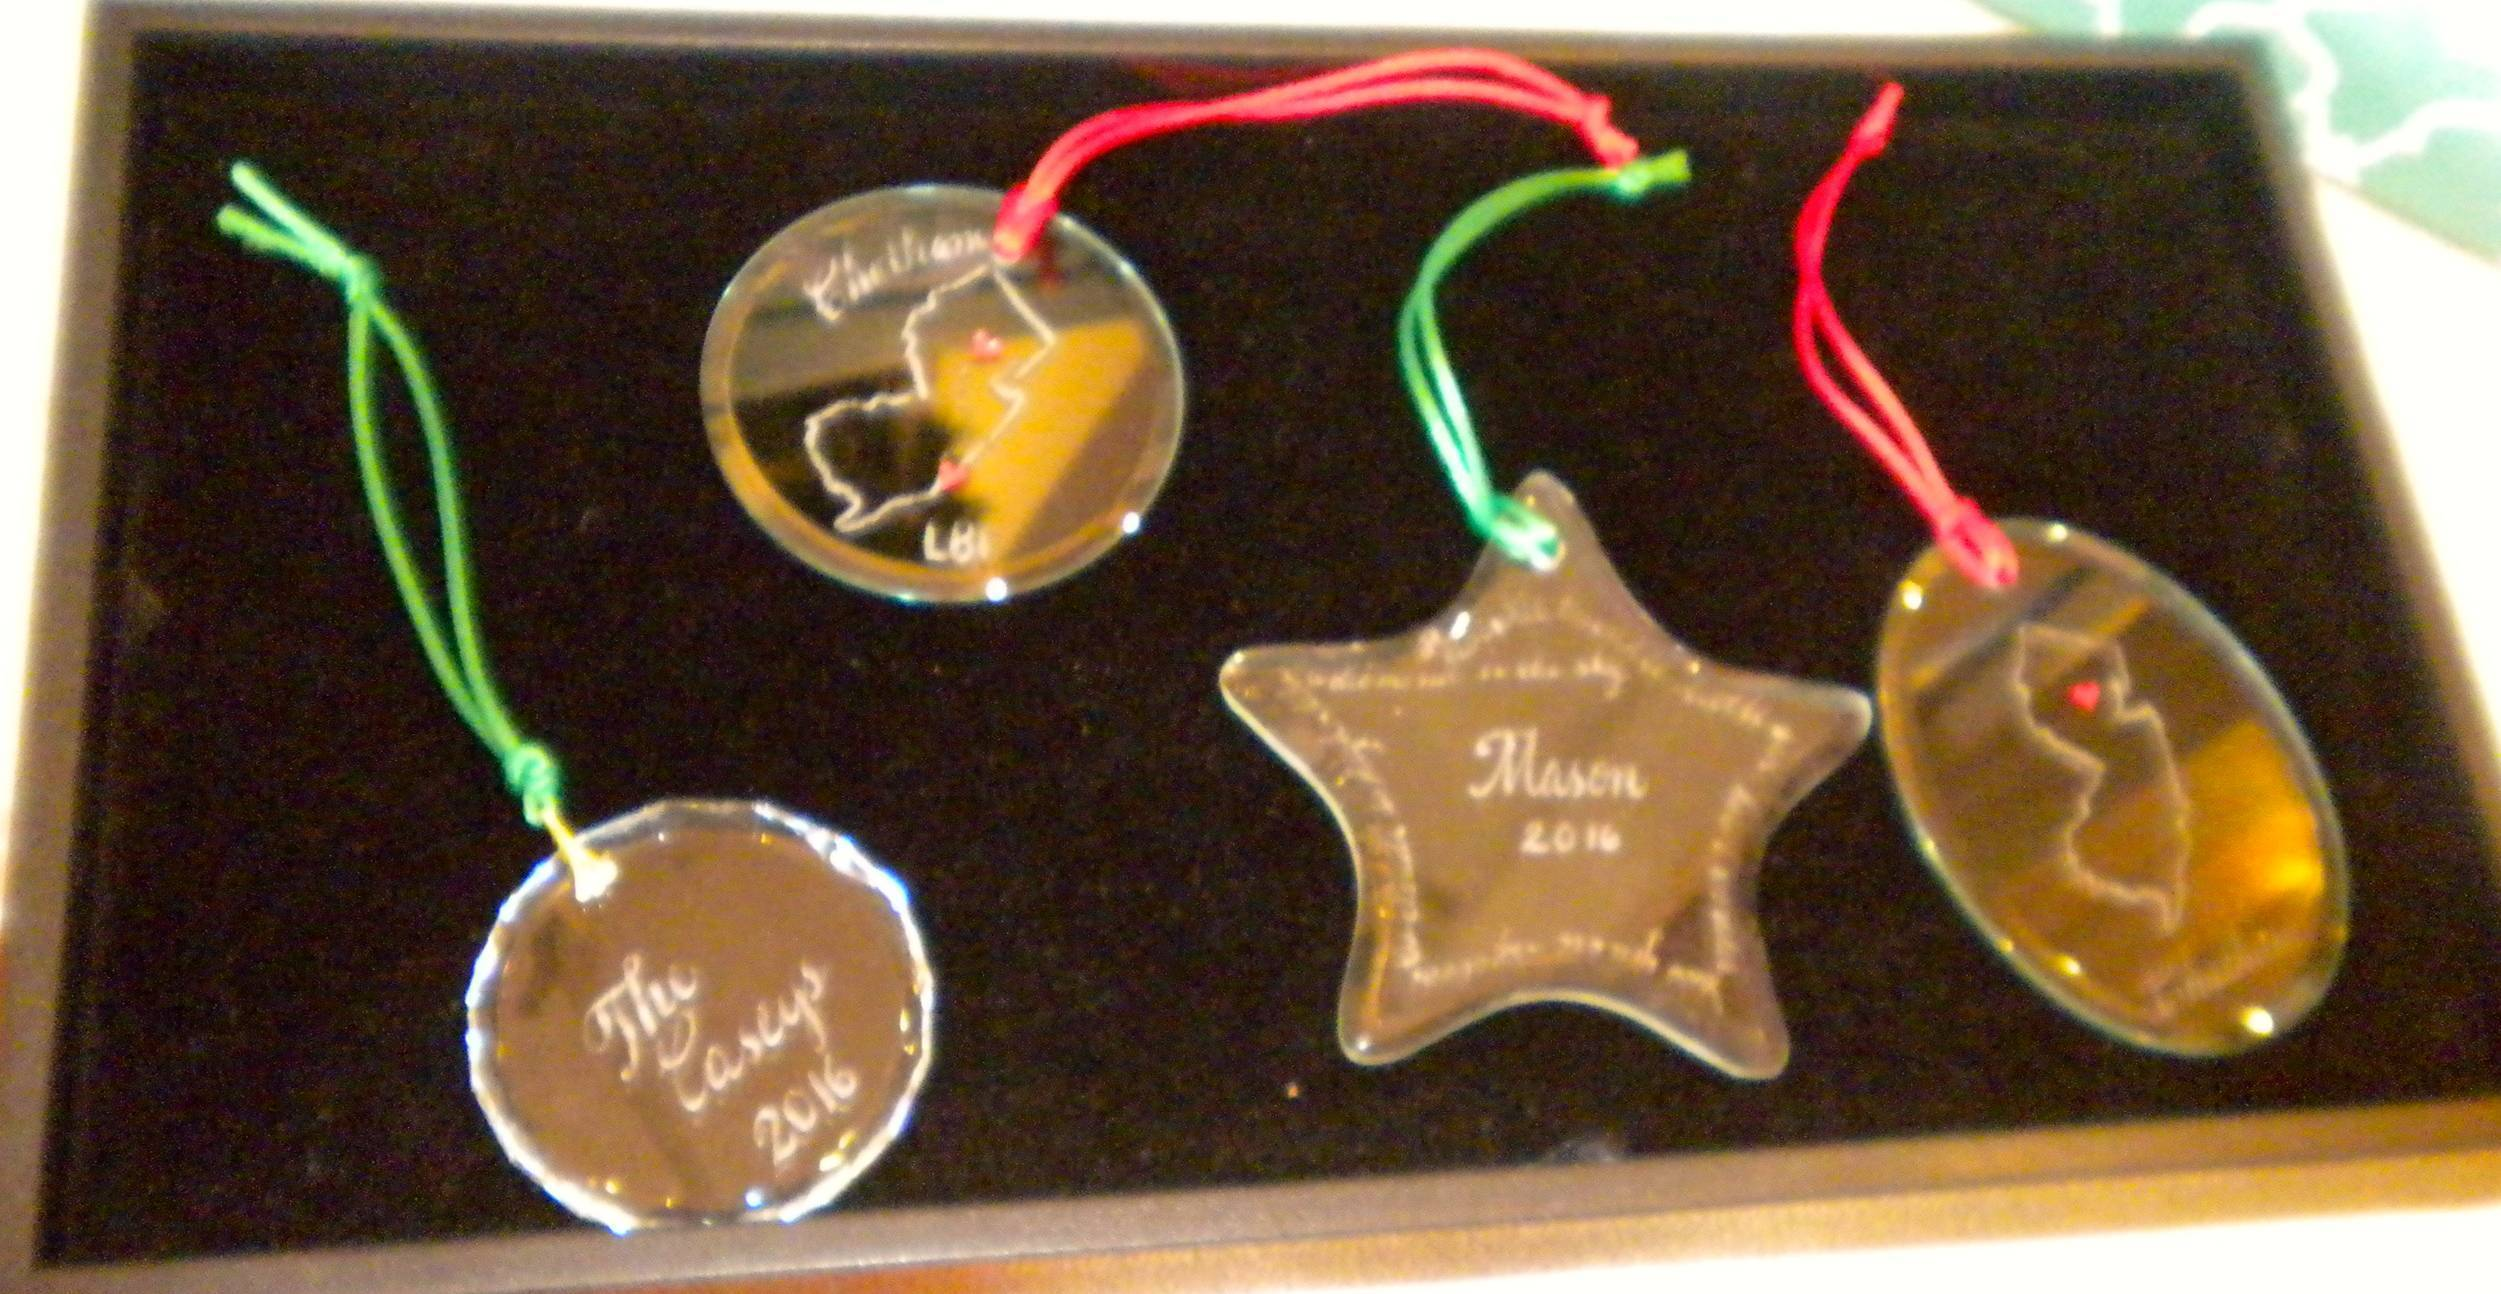 d0e17c4dd745dde7605e_88d9ad47bca3786ef87a_ornaments.JPG